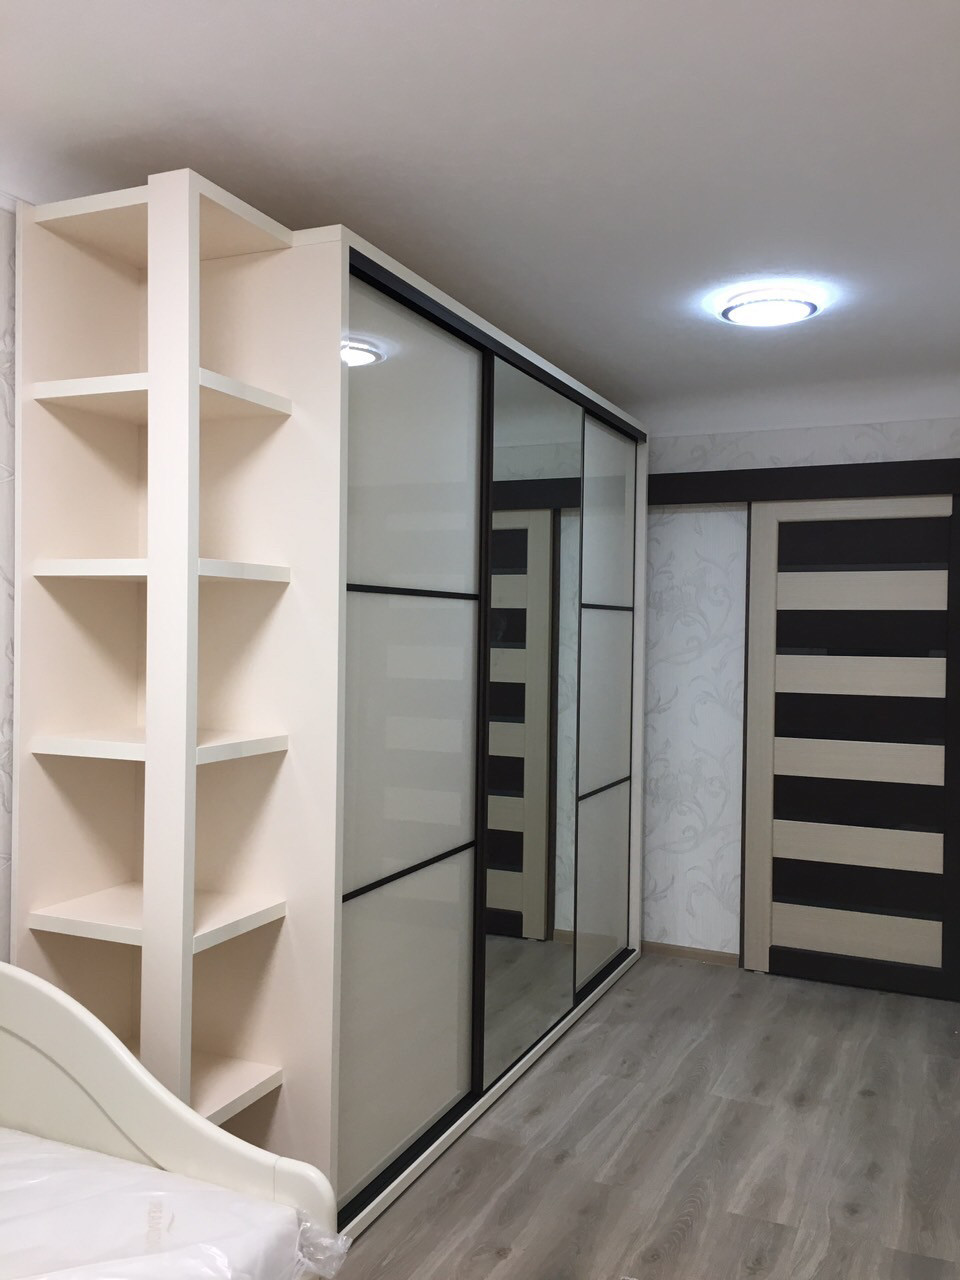 New 2019 шкаф купе в прихожую или спальню Slim с Lacobel стеклом